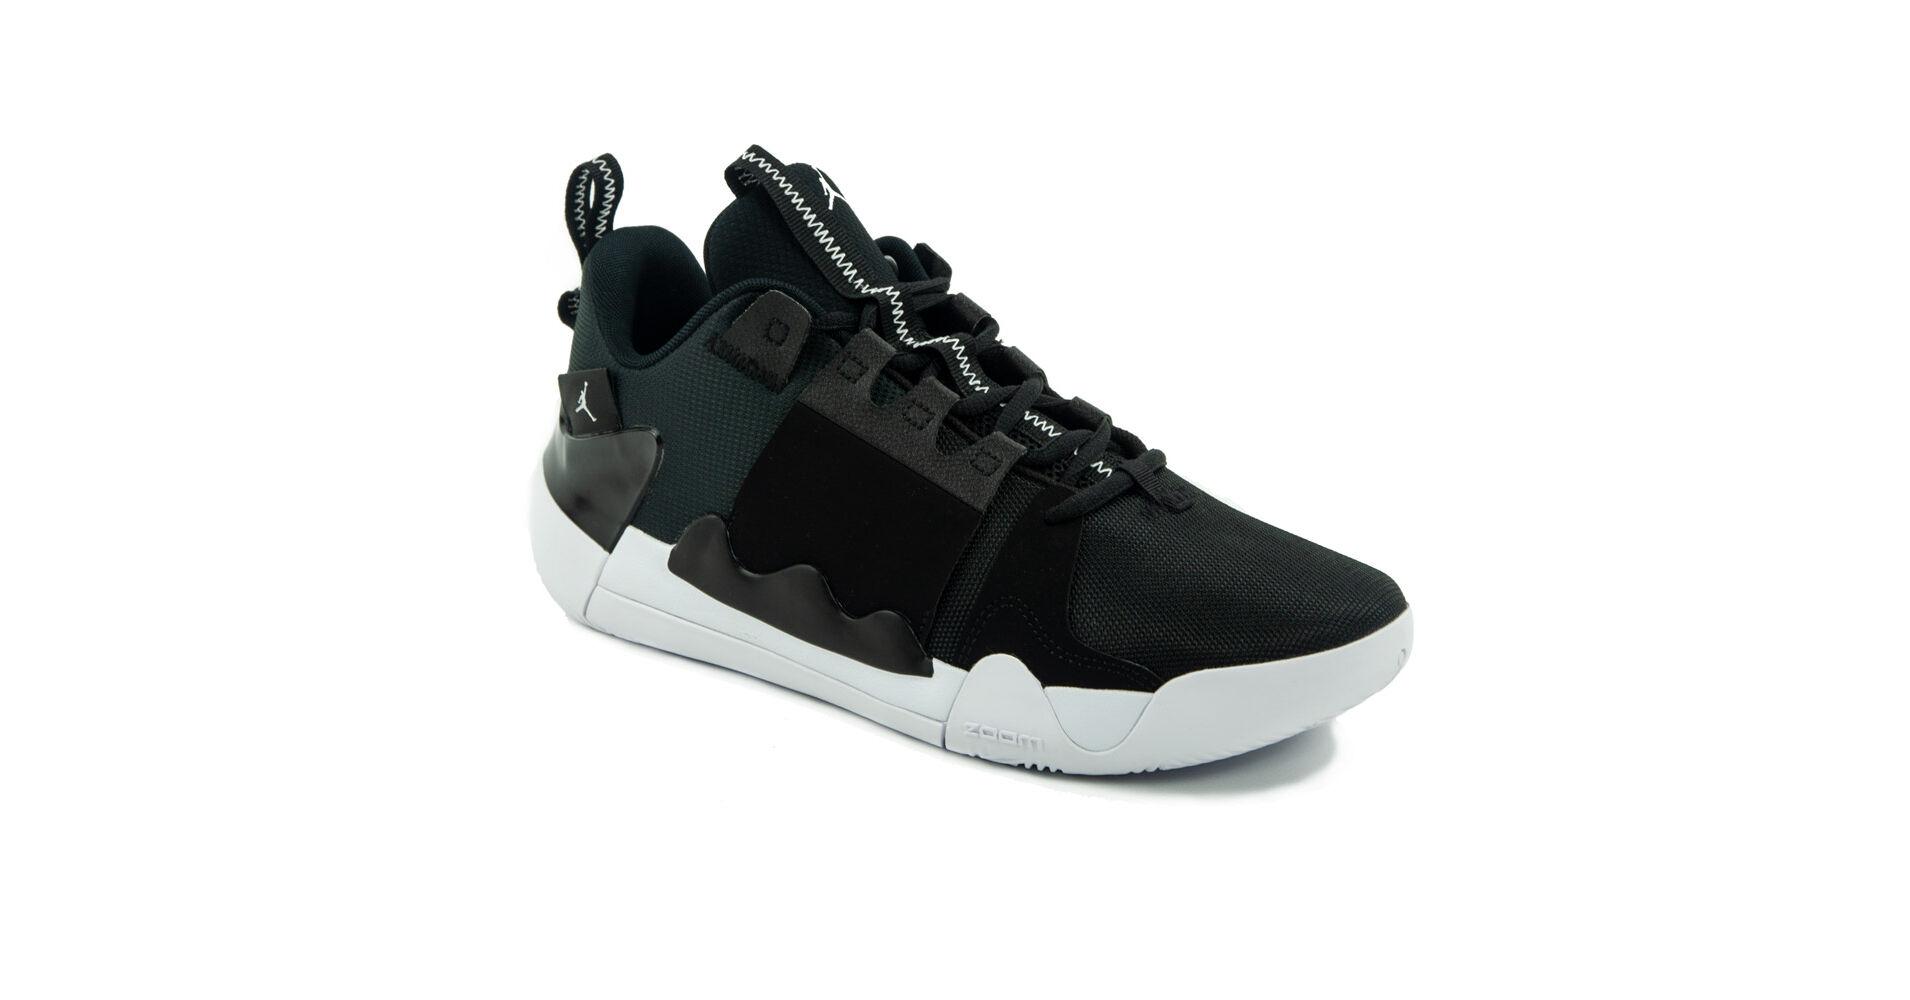 bb647b44fe56 Nike Jordan Zero Gravity Férfi Sportcipő-AO9027-001 - MadeInPapp a  CipőWebáruház